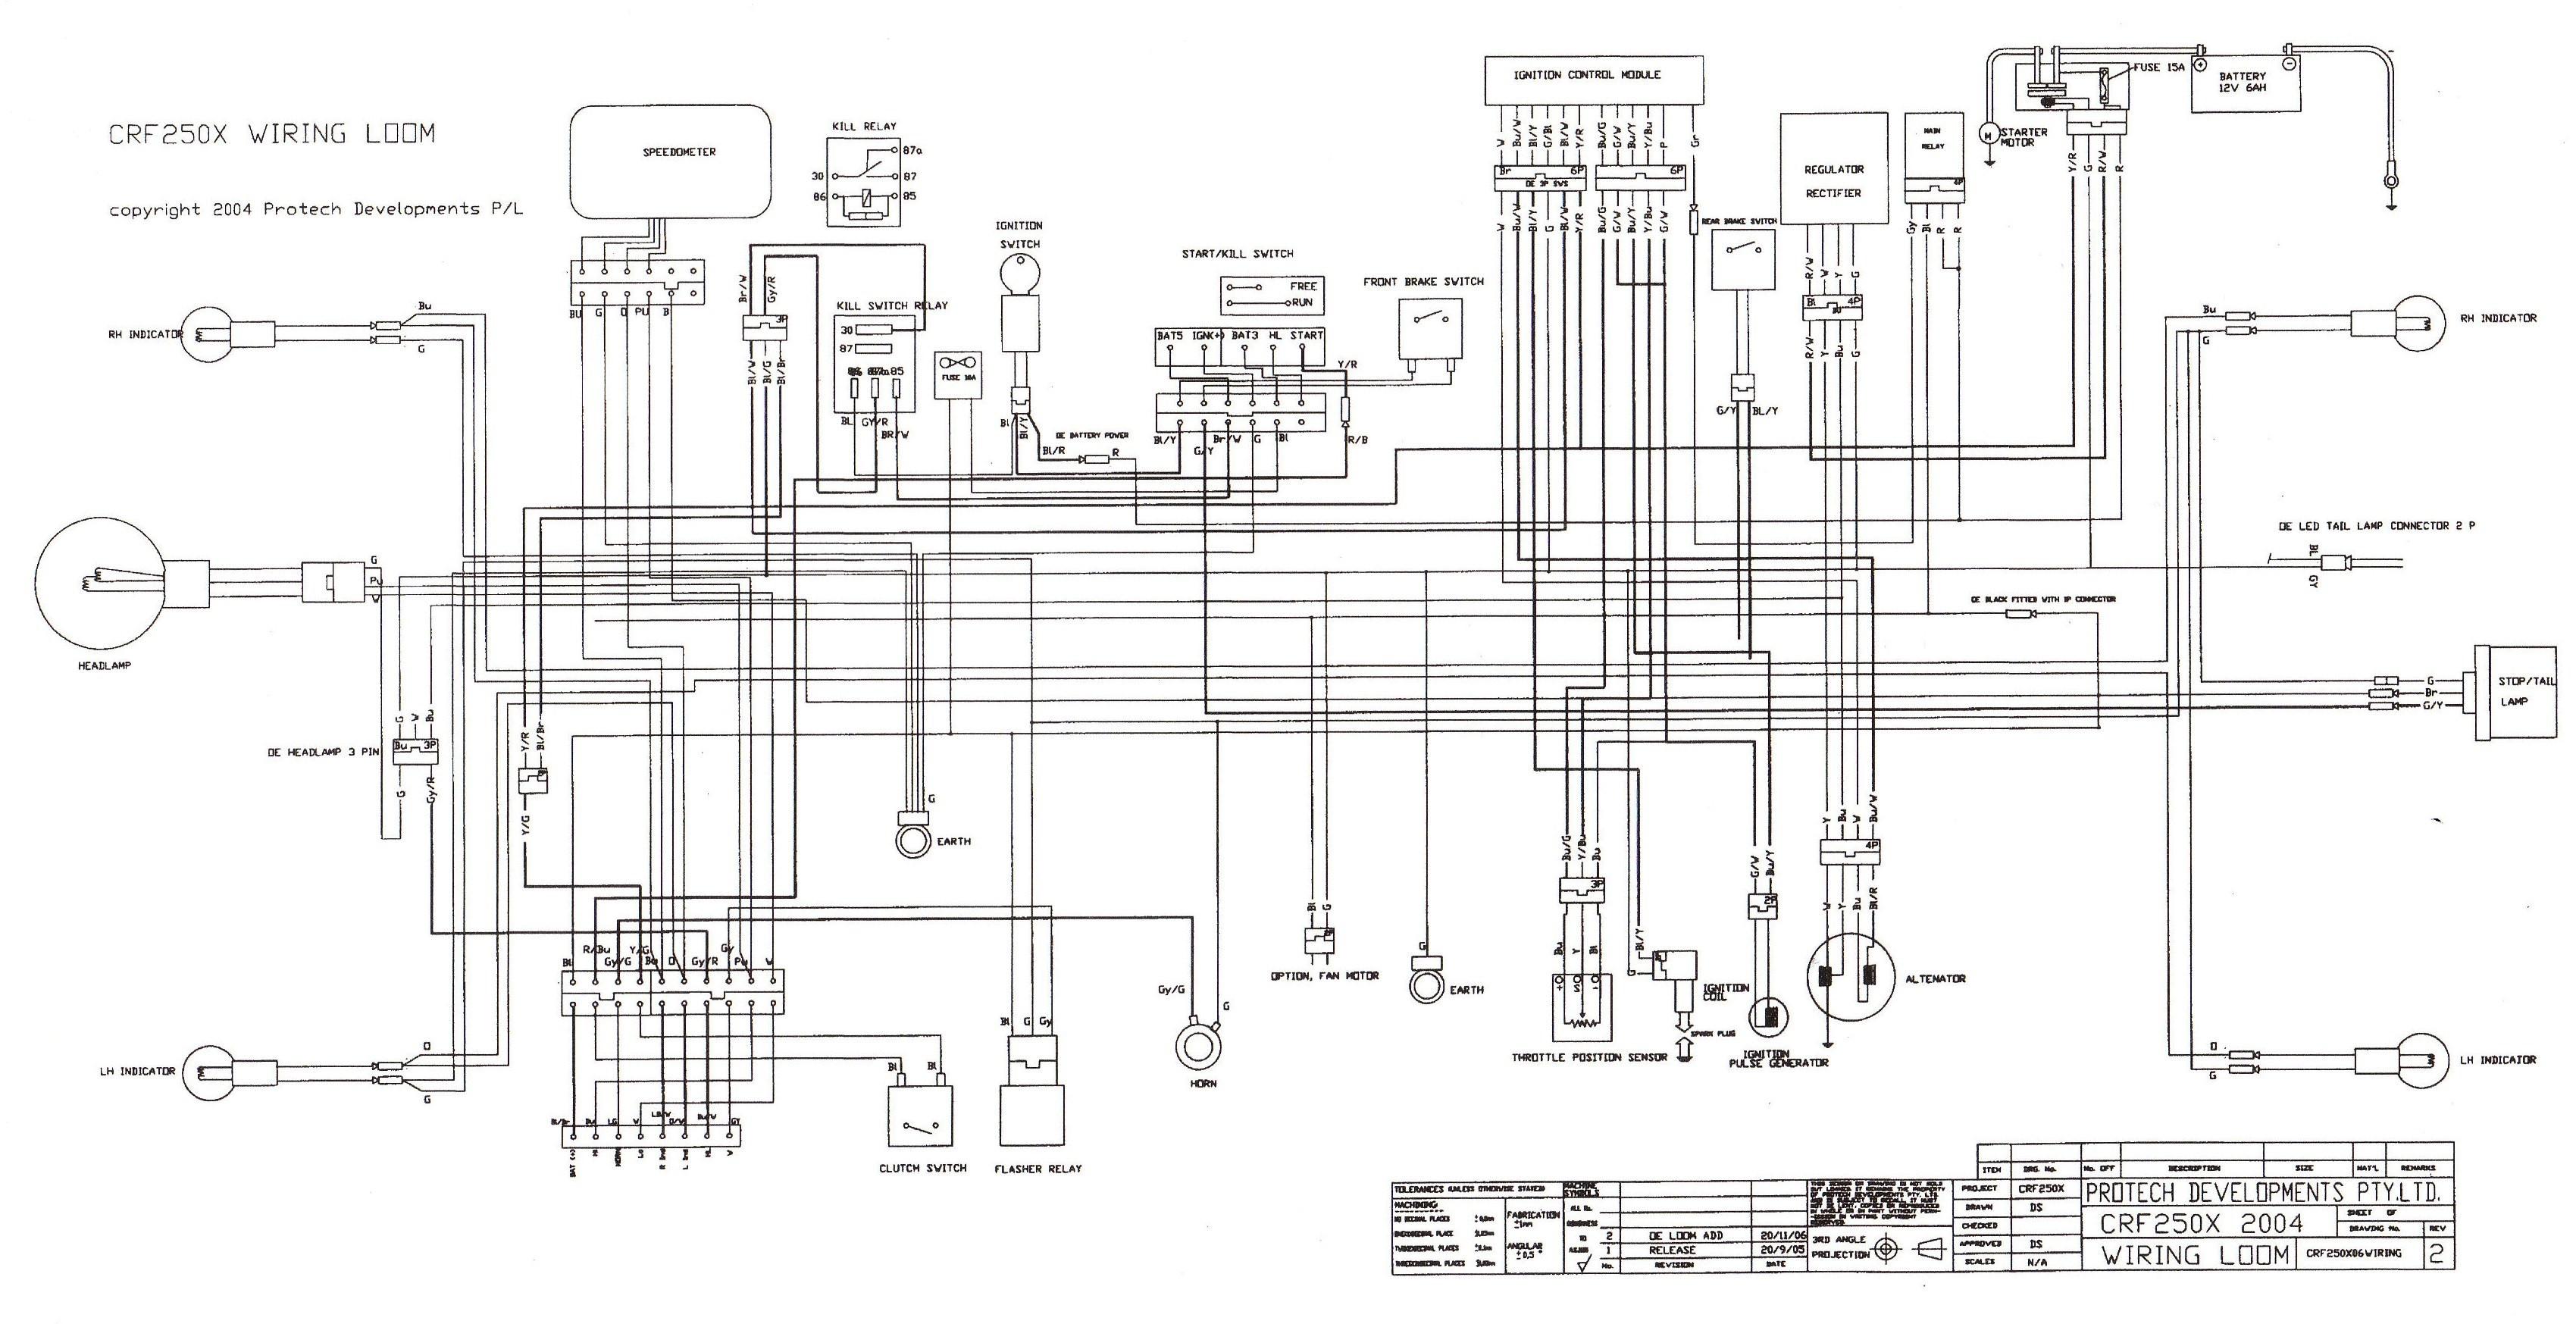 crf 250 wiring diagram - mua.ulakan.kultur-im-revier.de honda crf250l wiring diagram  diagram source - wiring schematic diagram